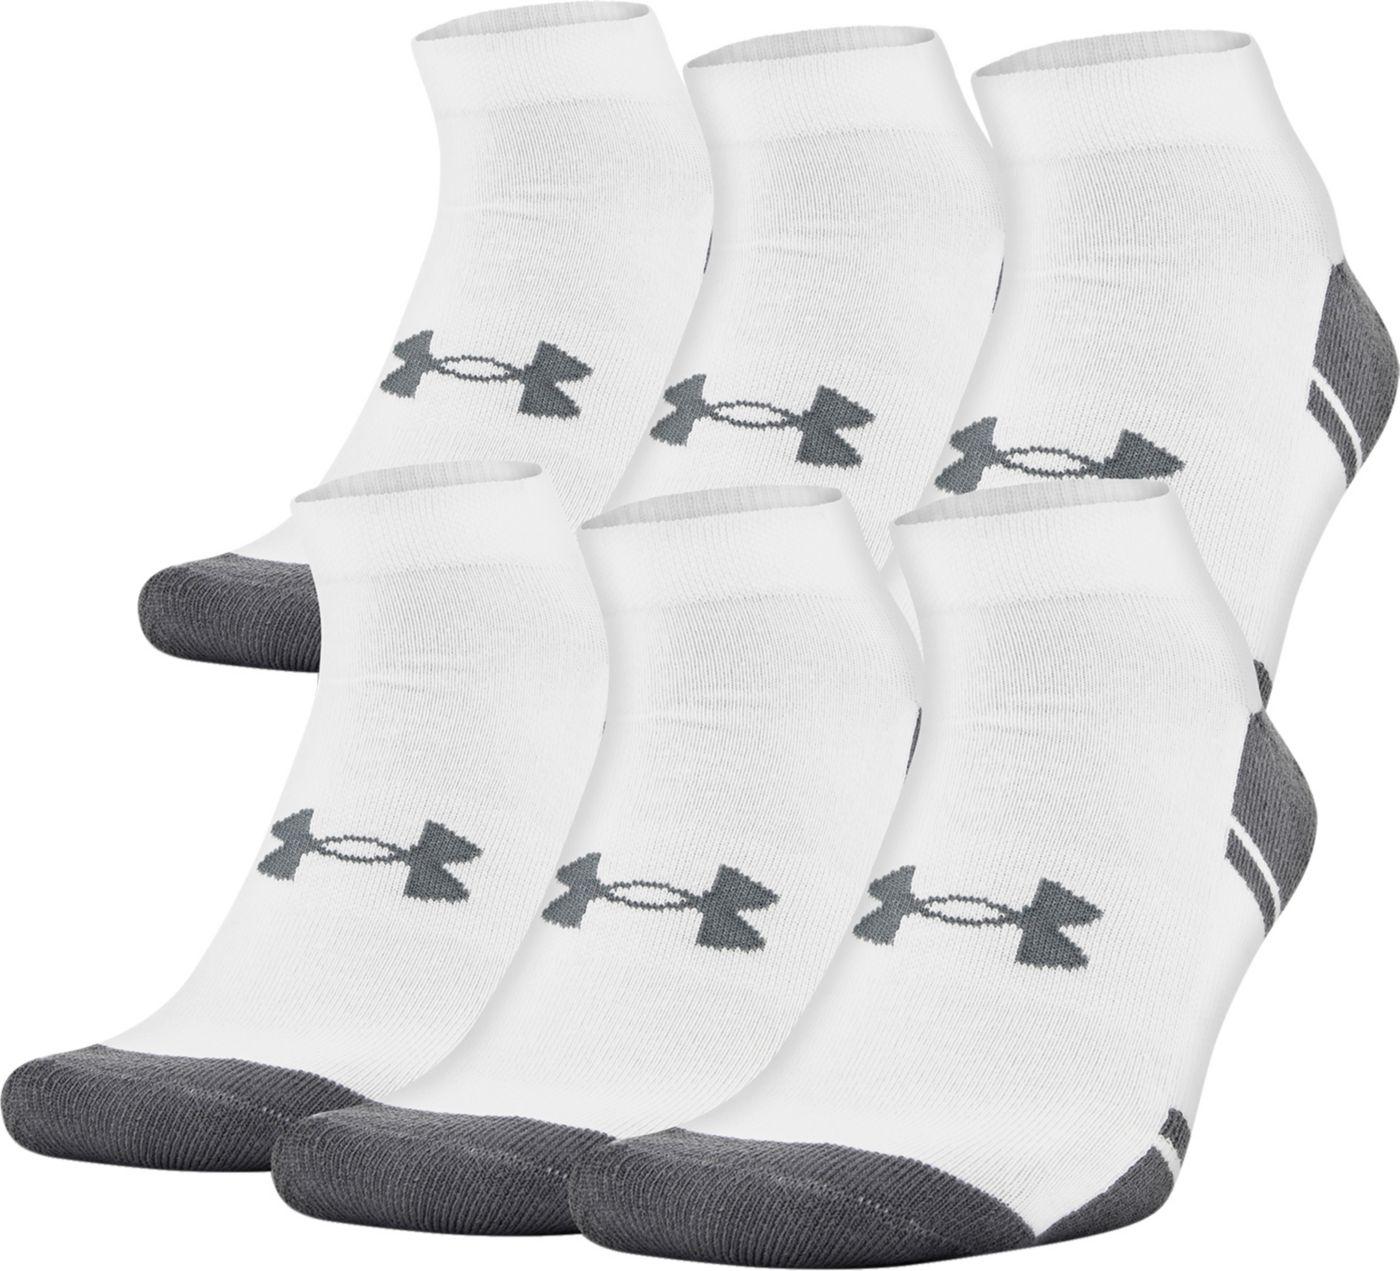 Under Armour Resistor Low Cut Athletic Socks - 6 Pack